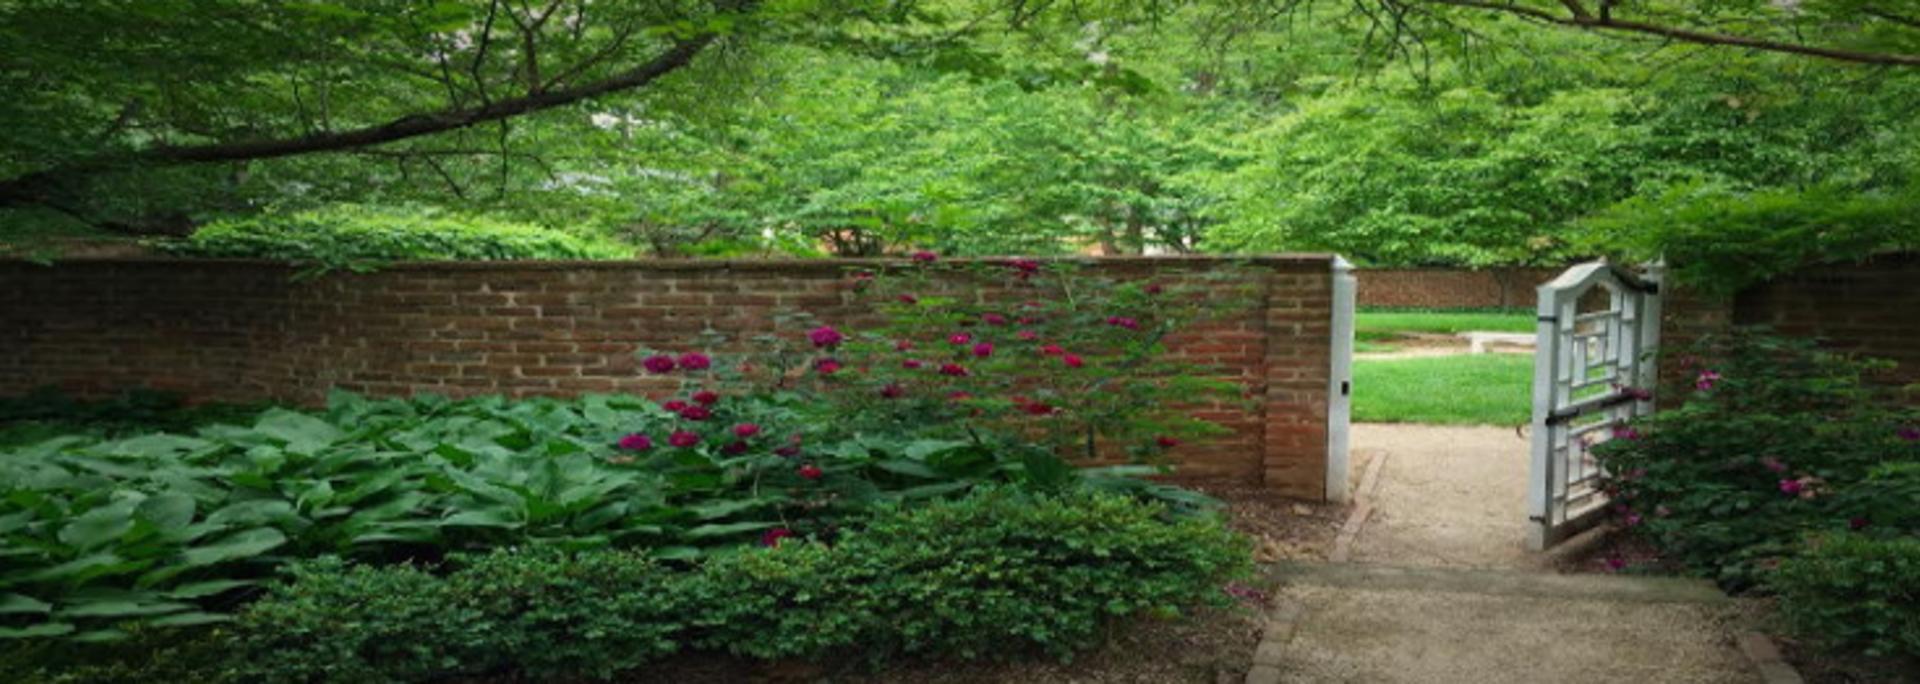 UVA Gardens